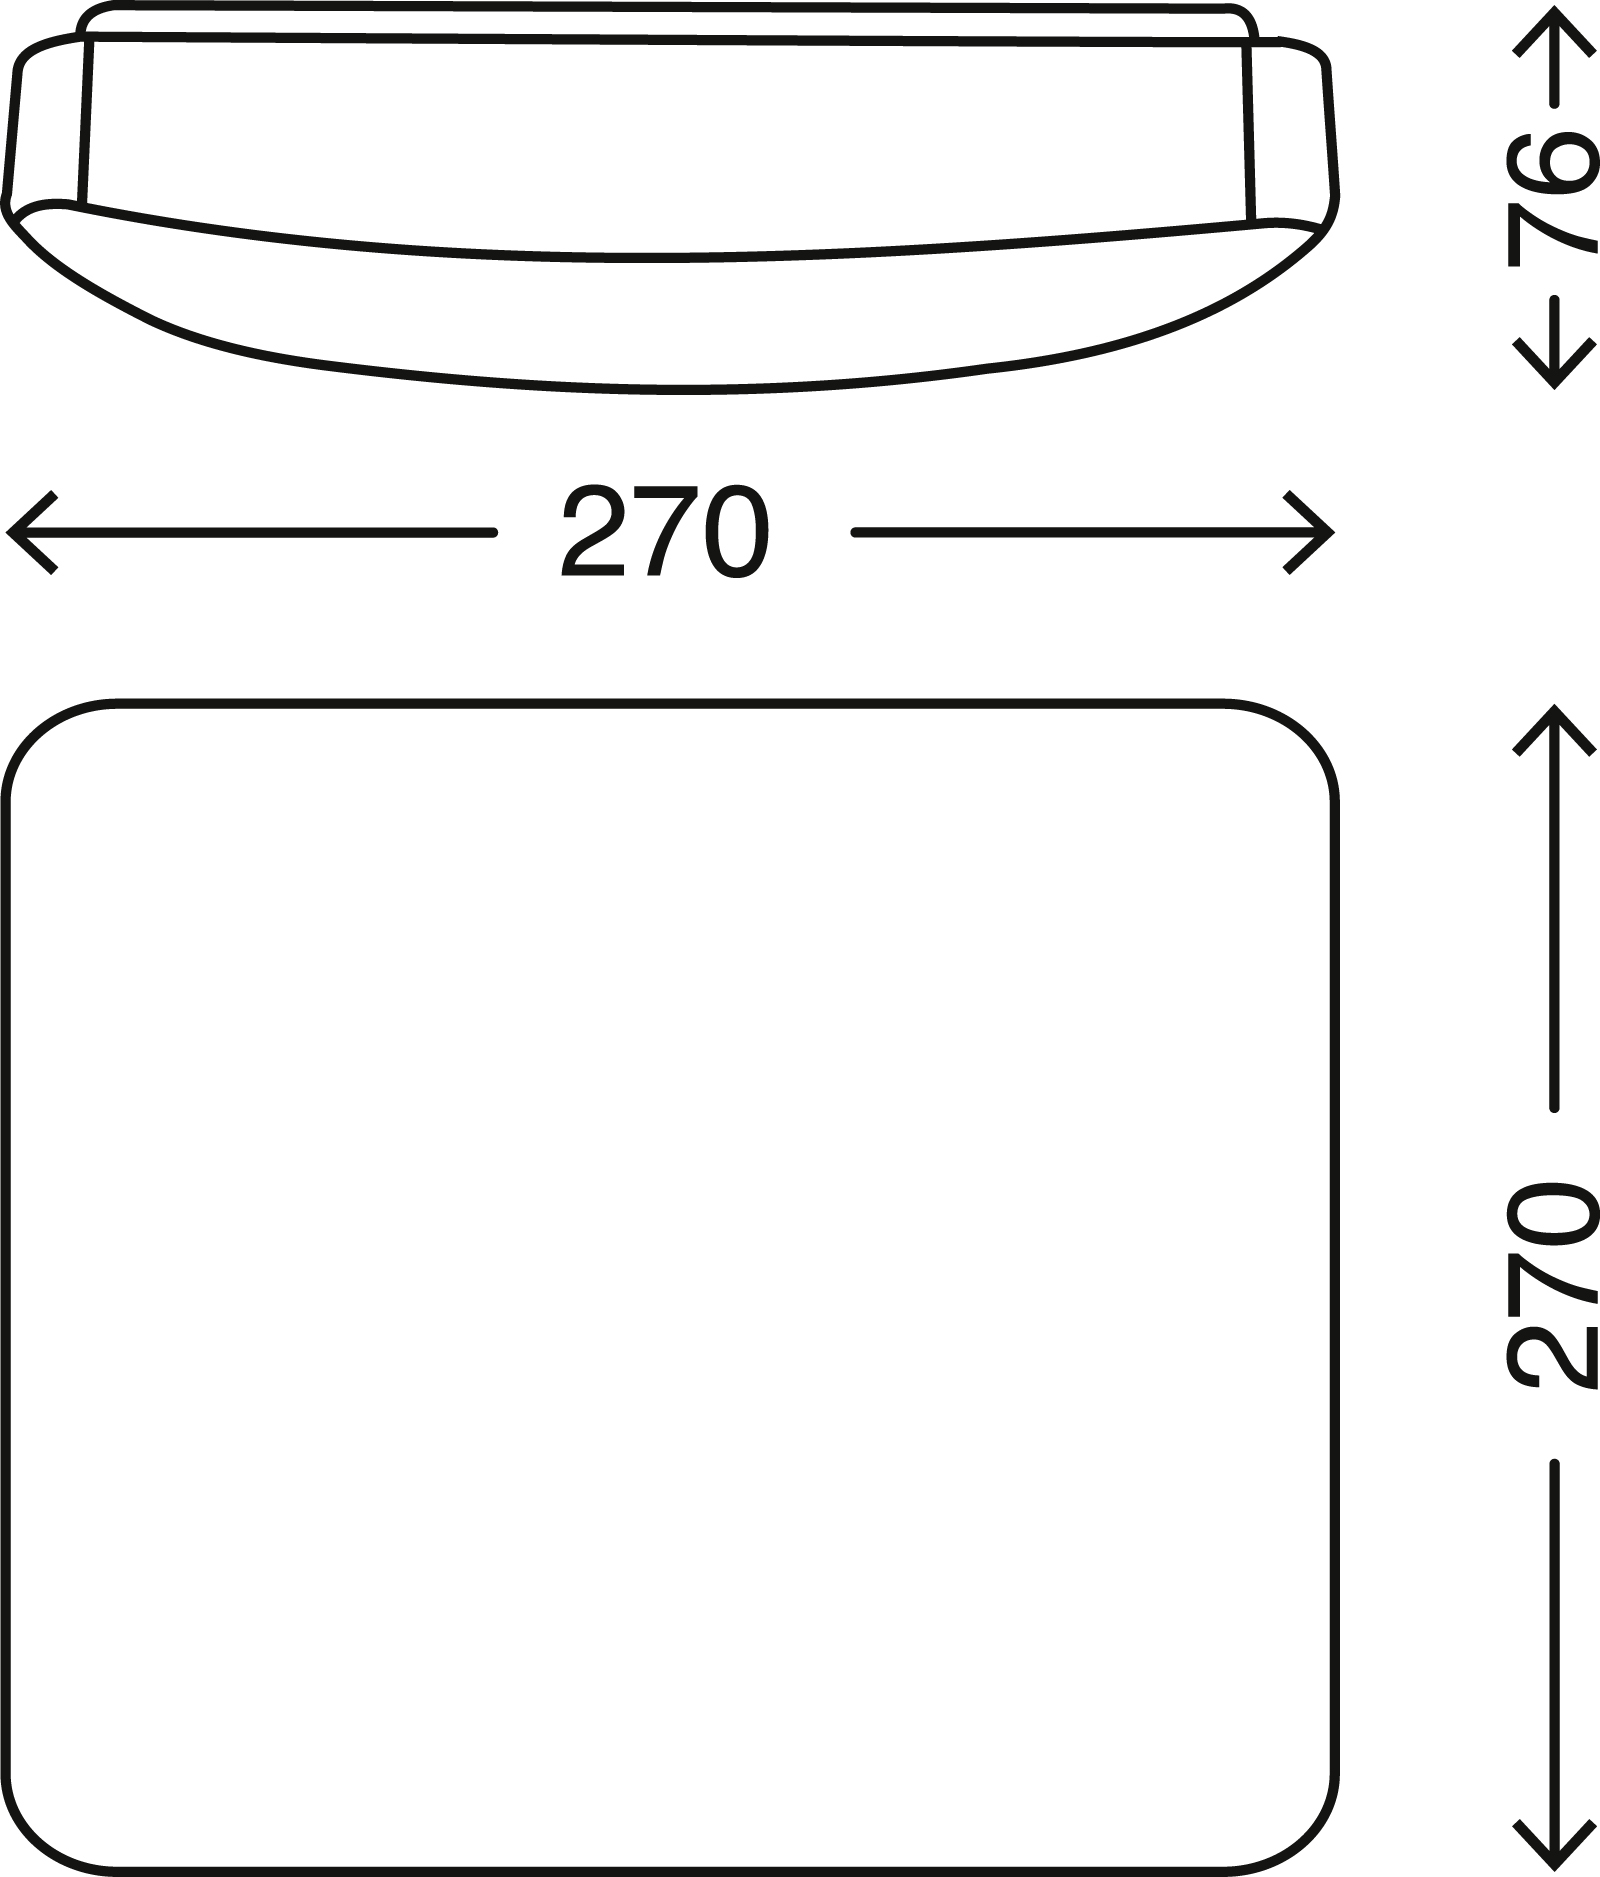 TELEFUNKEN Sensor LED Deckenleuchte, 27 cm, 12 W, Weiss